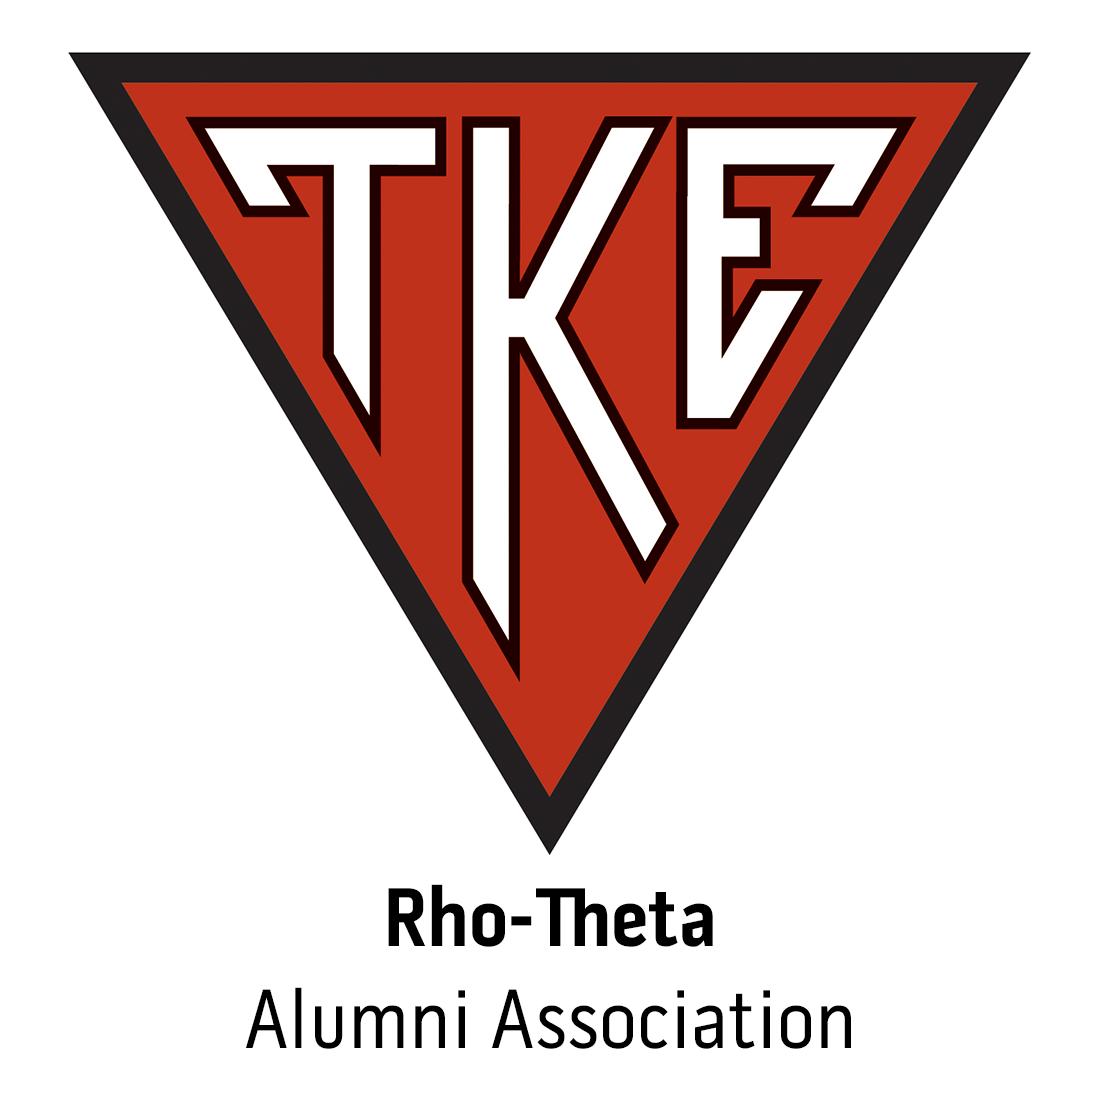 Rho-Theta Alumni Association at Lake Superior State University